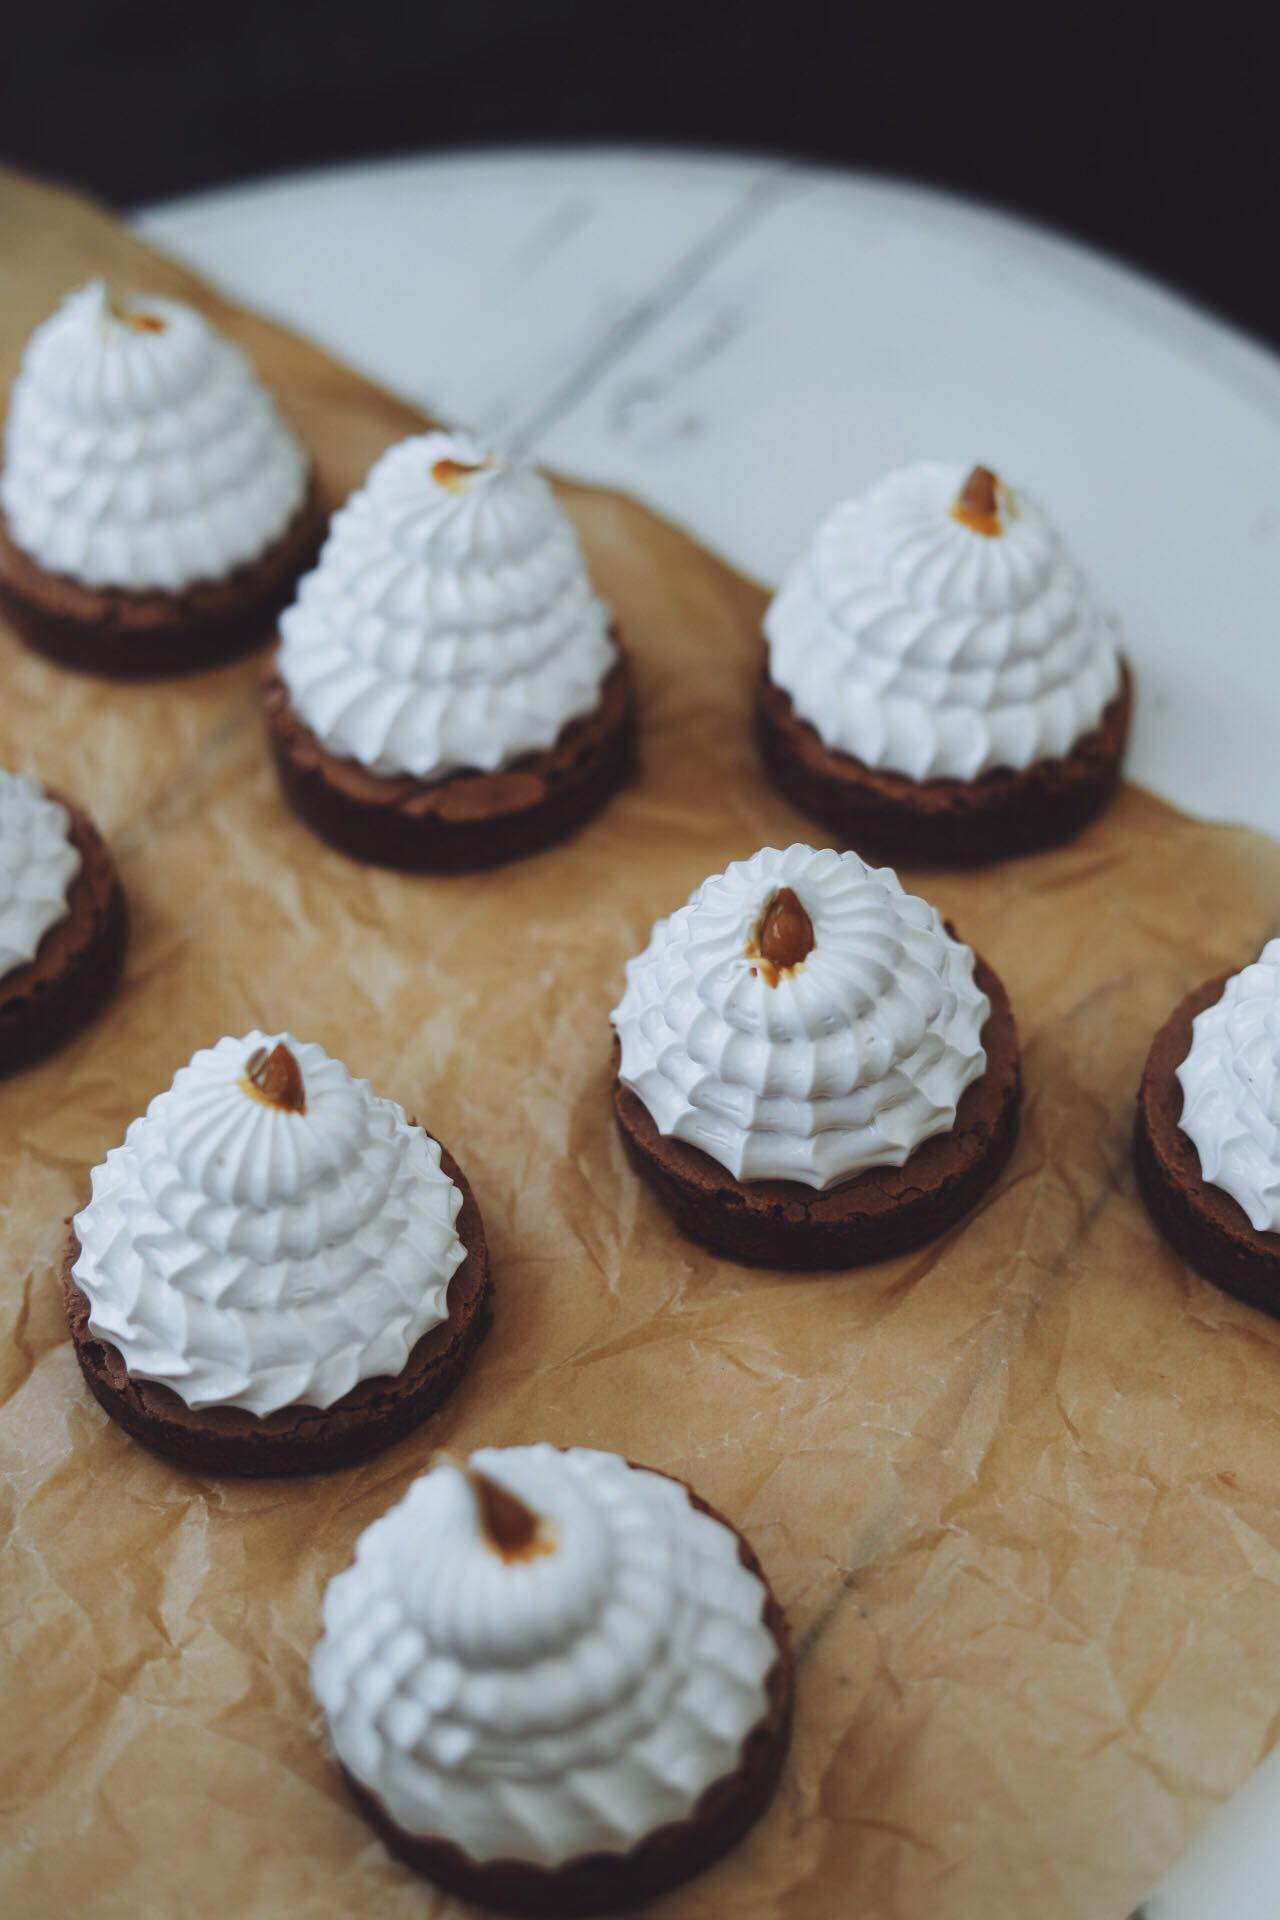 Flødeboller med browniebund, kaffeskum og dulce de leche